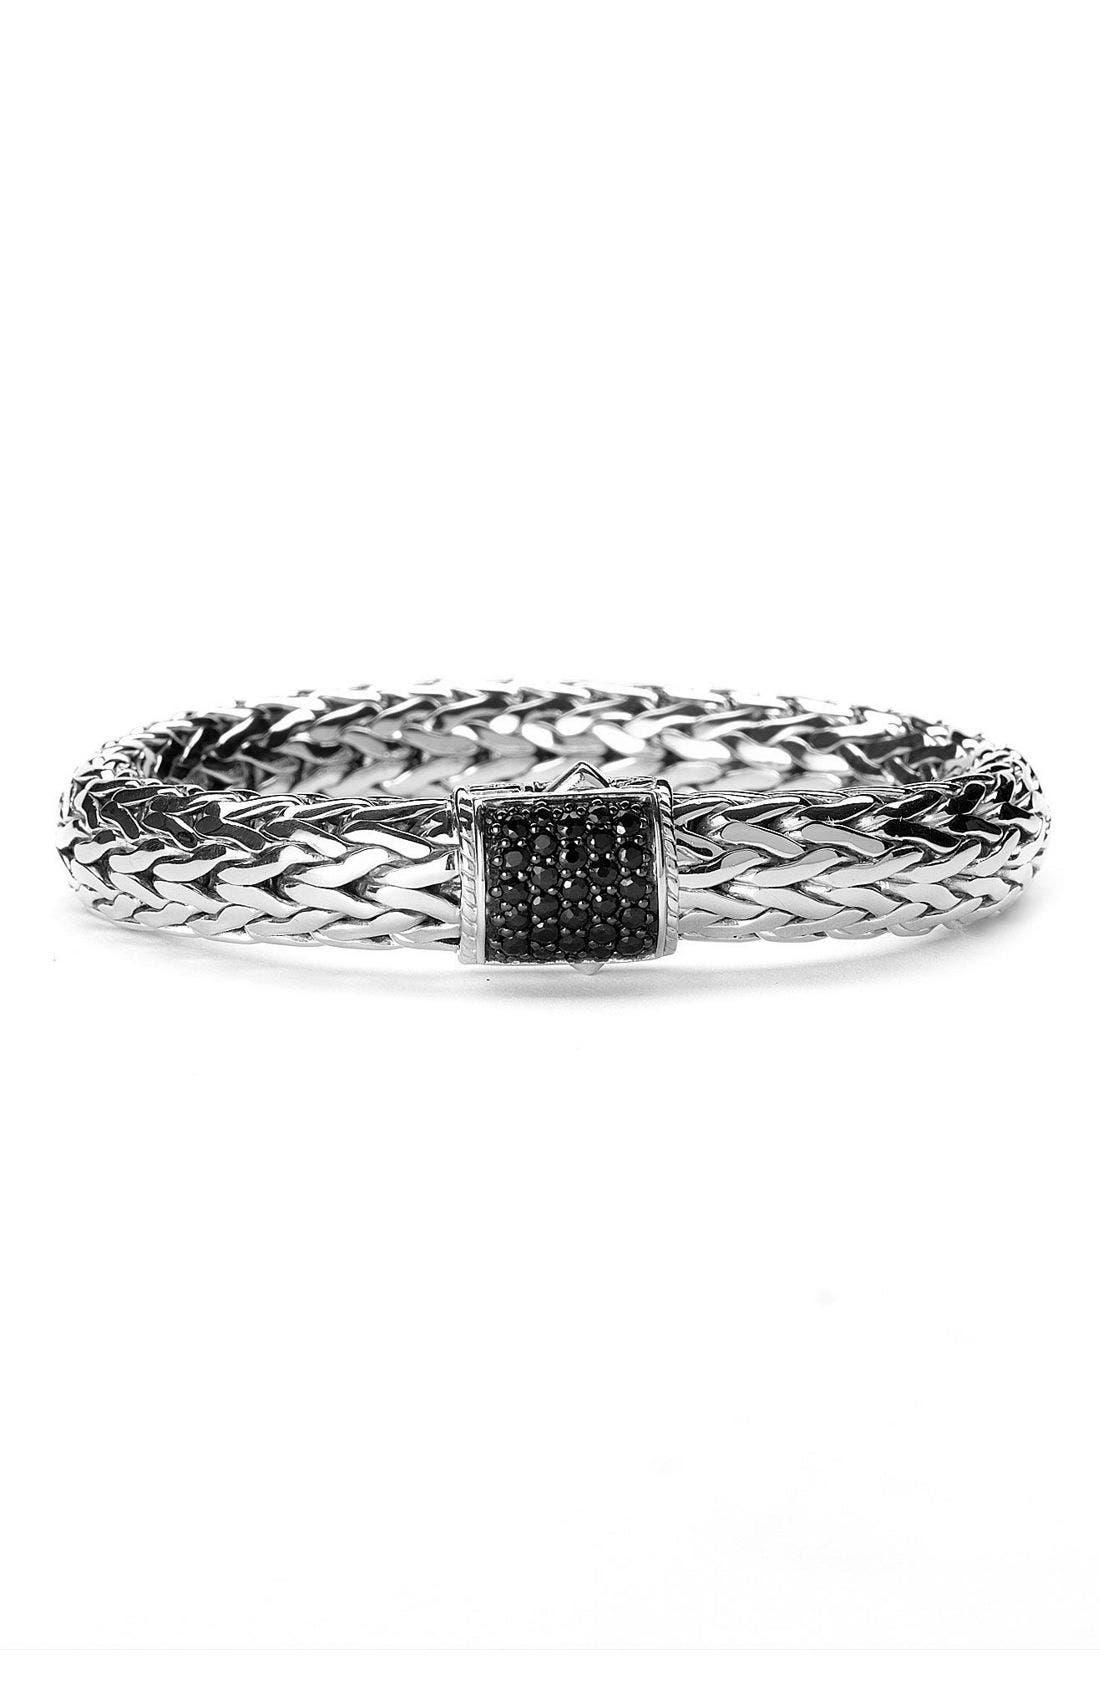 Alternate Image 1 Selected - John Hardy 'Batu' Chain Bracelet